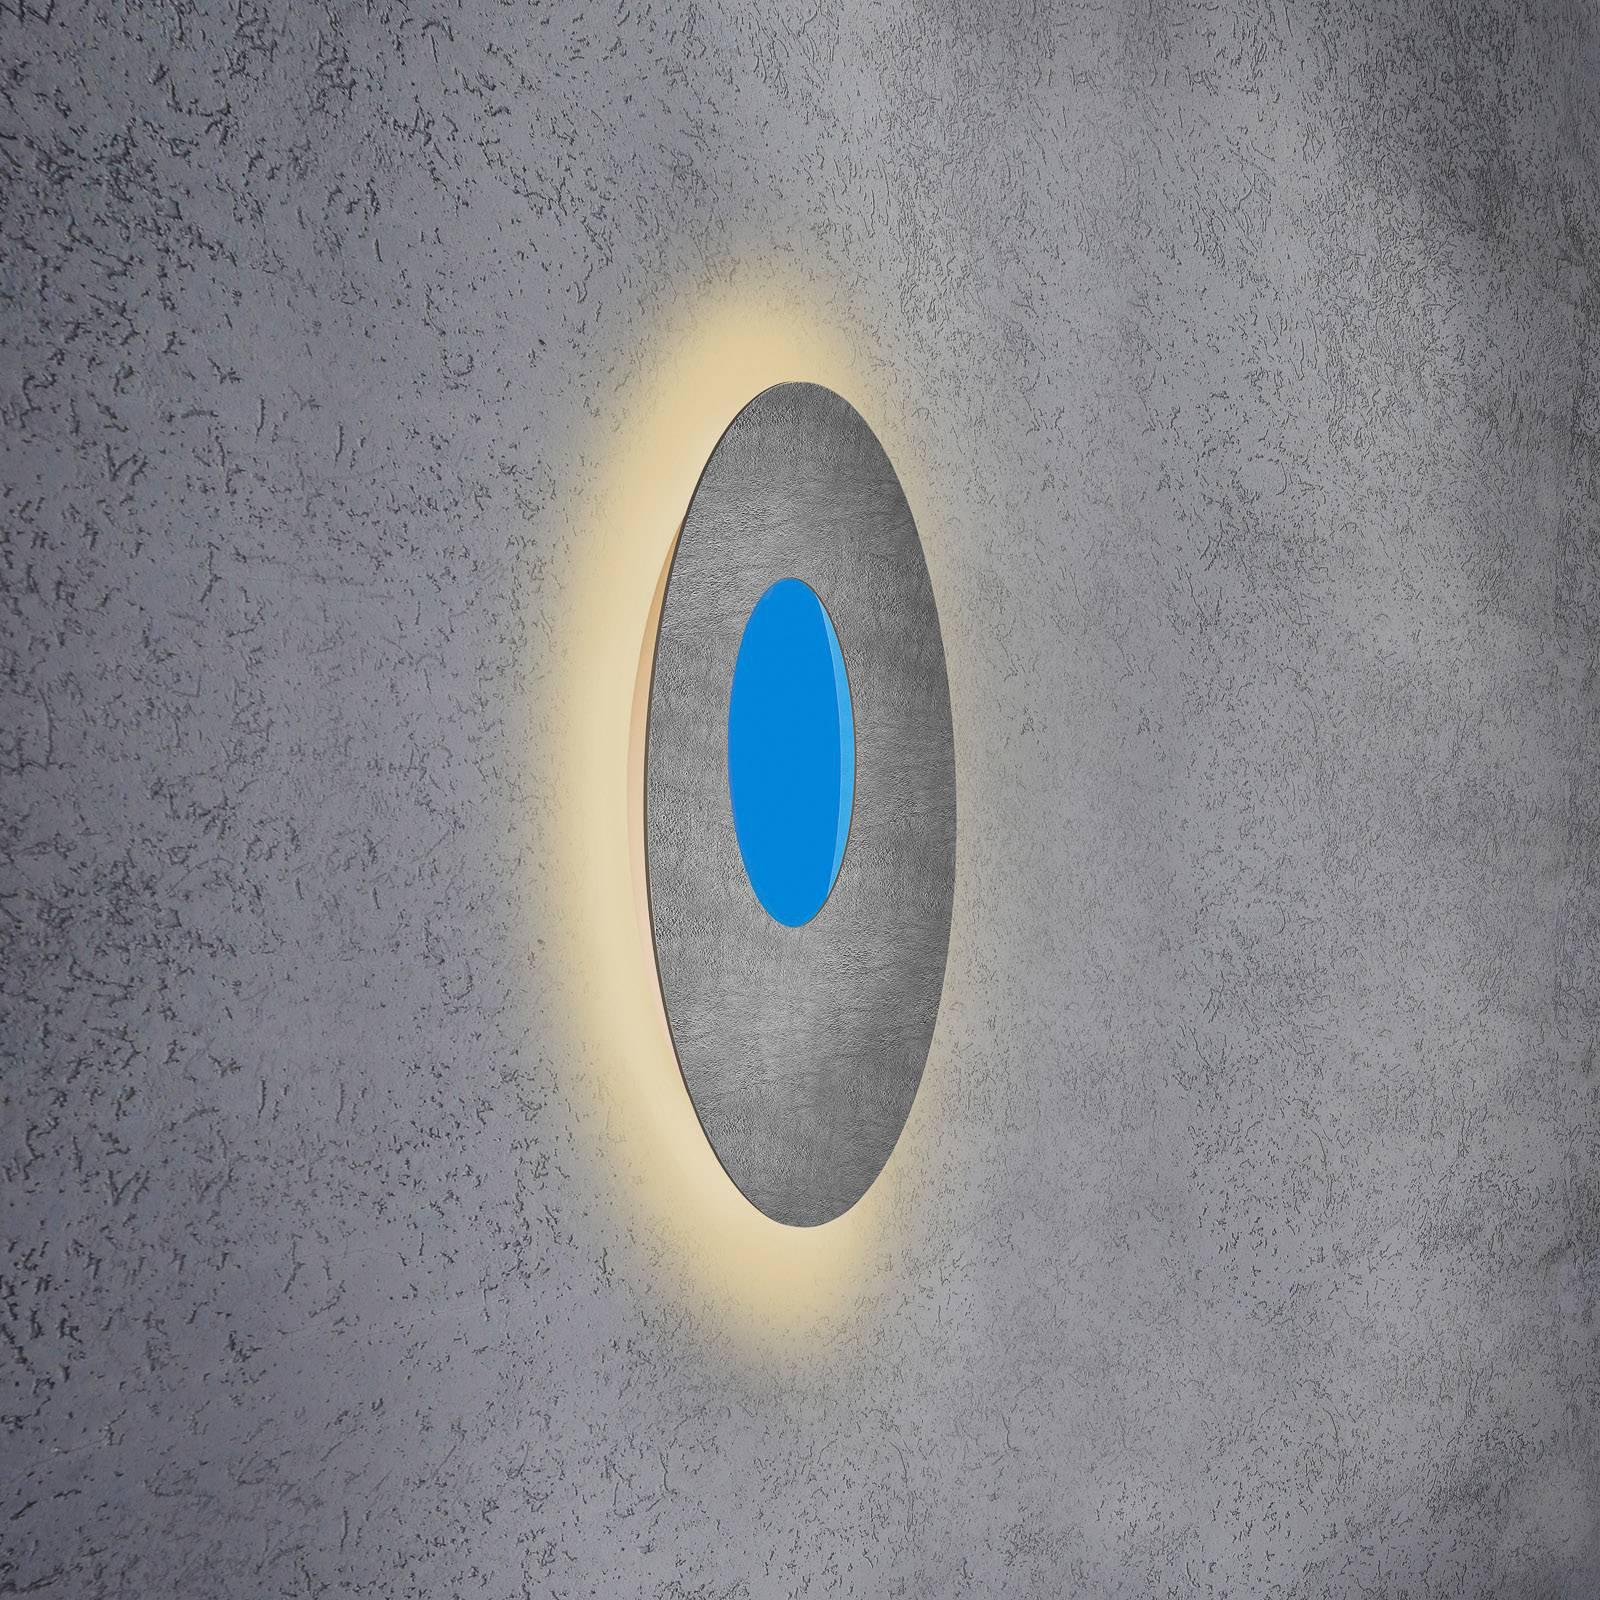 Escale Blade Open LED-vegglampe RGB+W betong Ø59cm